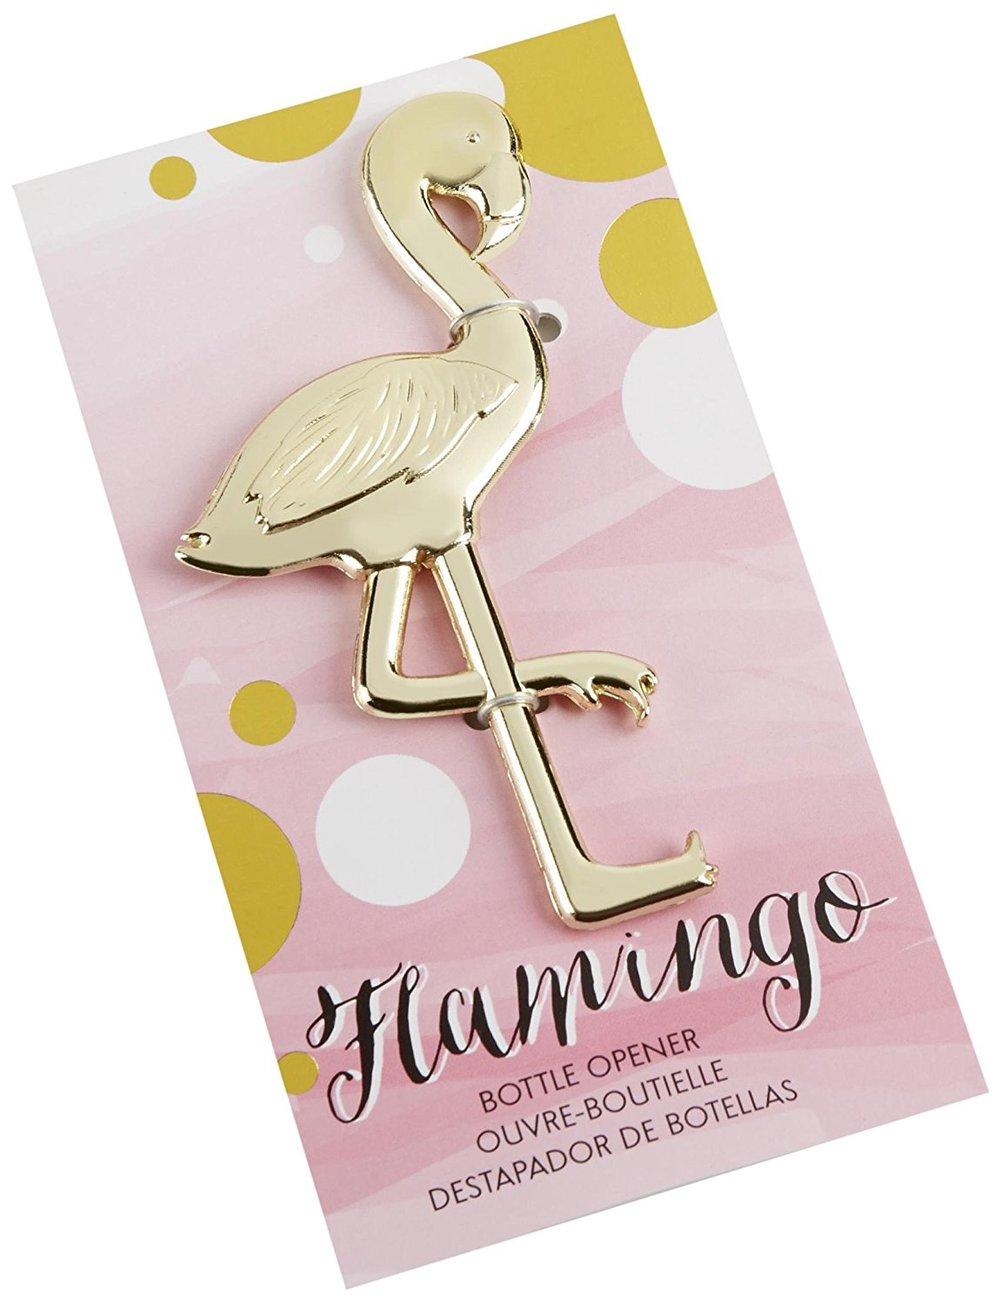 flamingo-bottle-opener.jpg